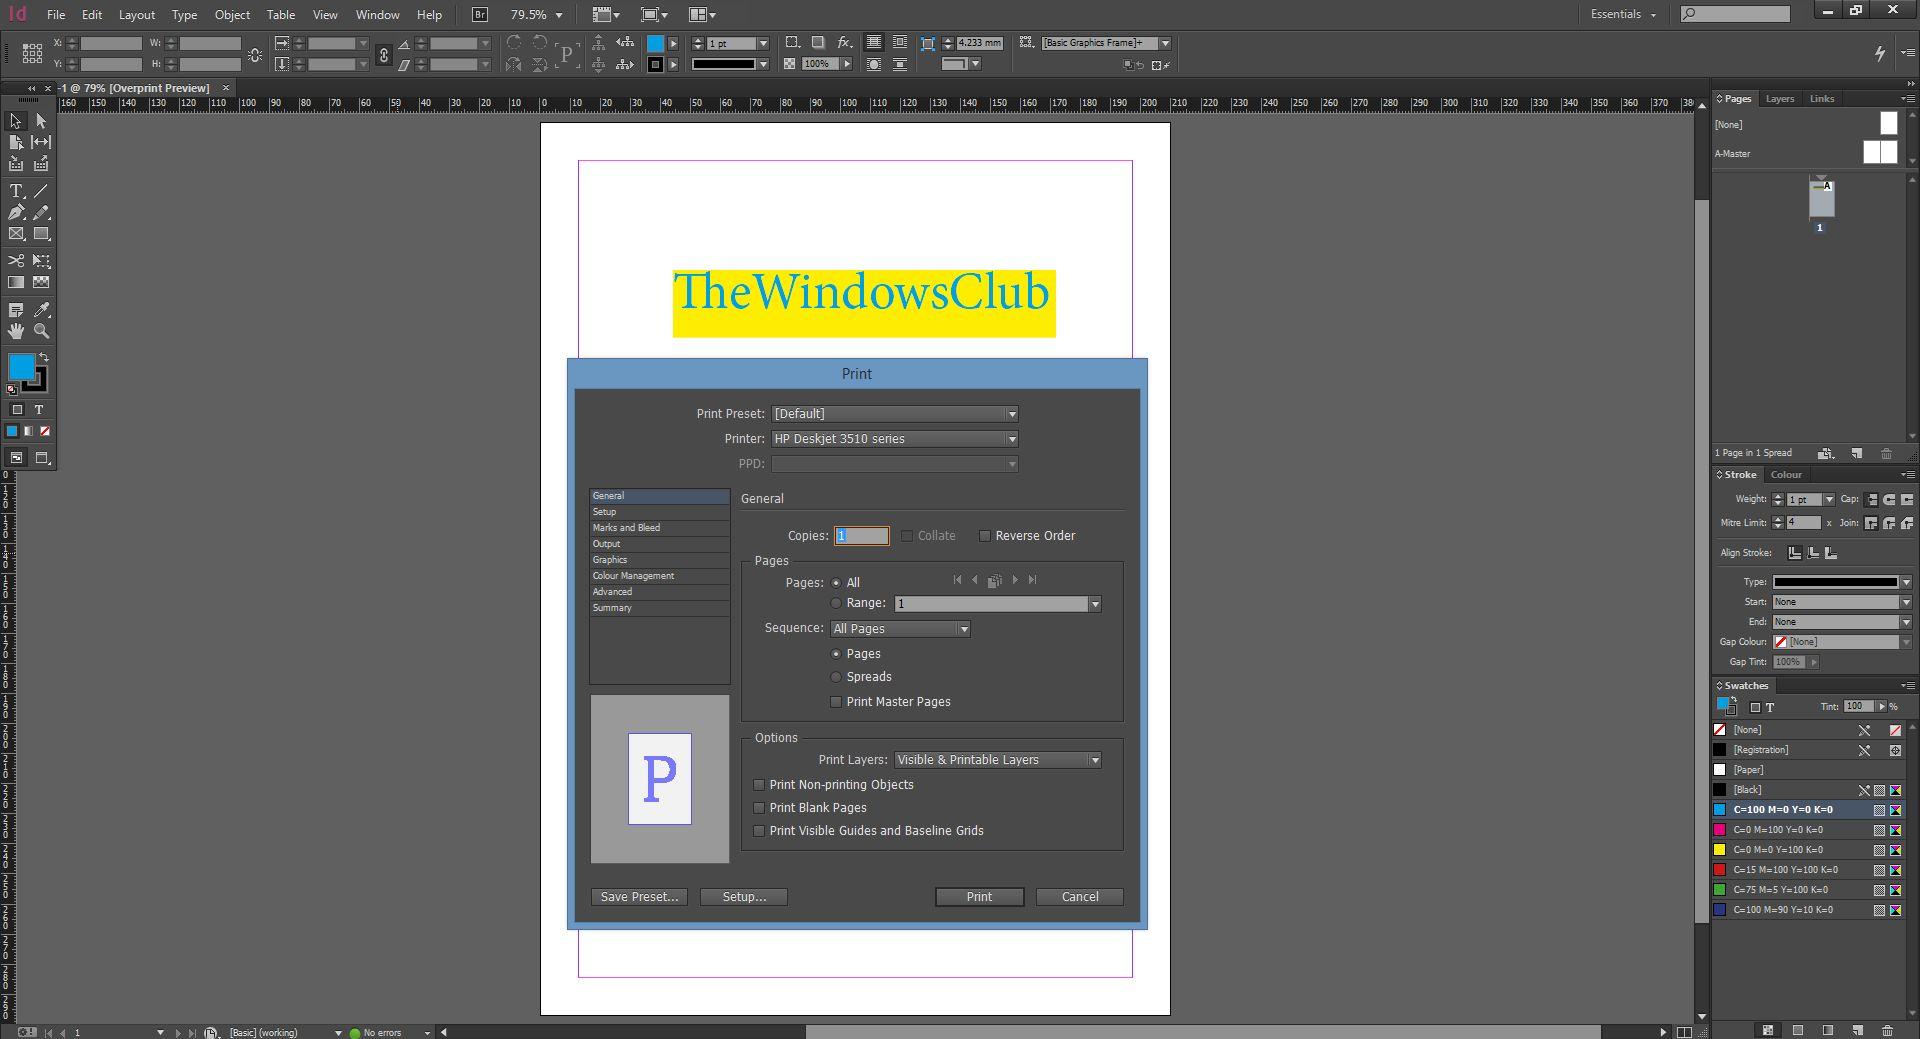 Tutorial de Adobe InDesign CC 2014 para principiantes